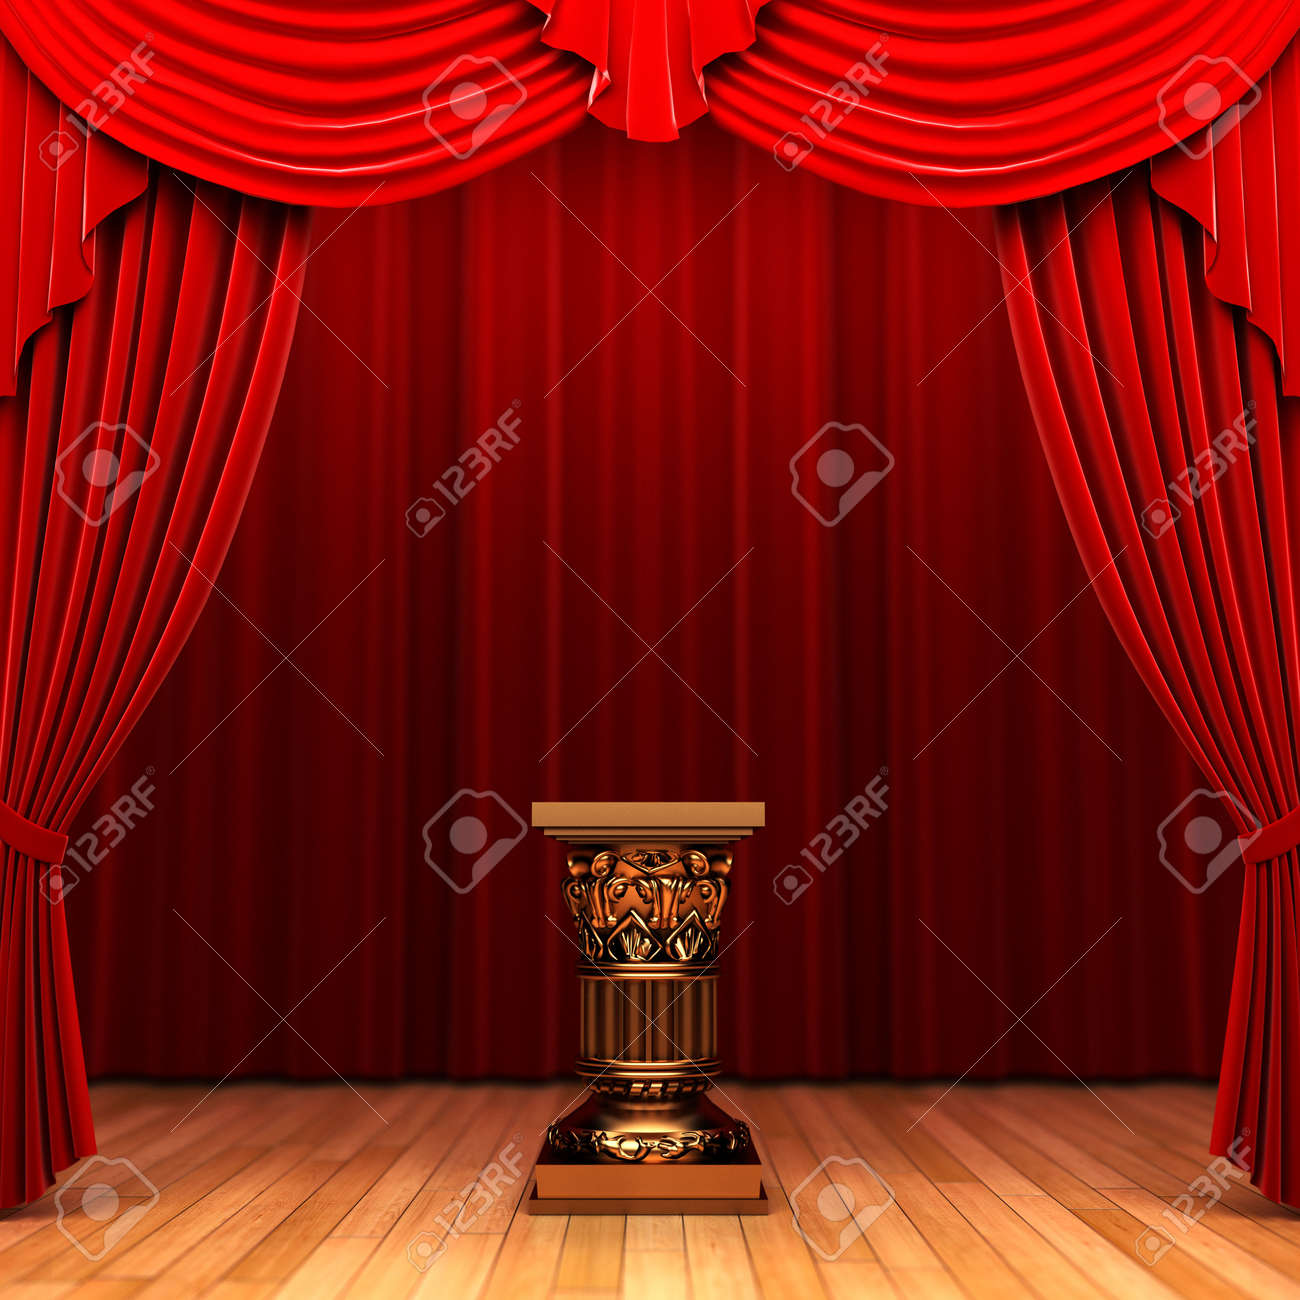 Red velvet curtain and Pedestal Stock Photo - 6177791